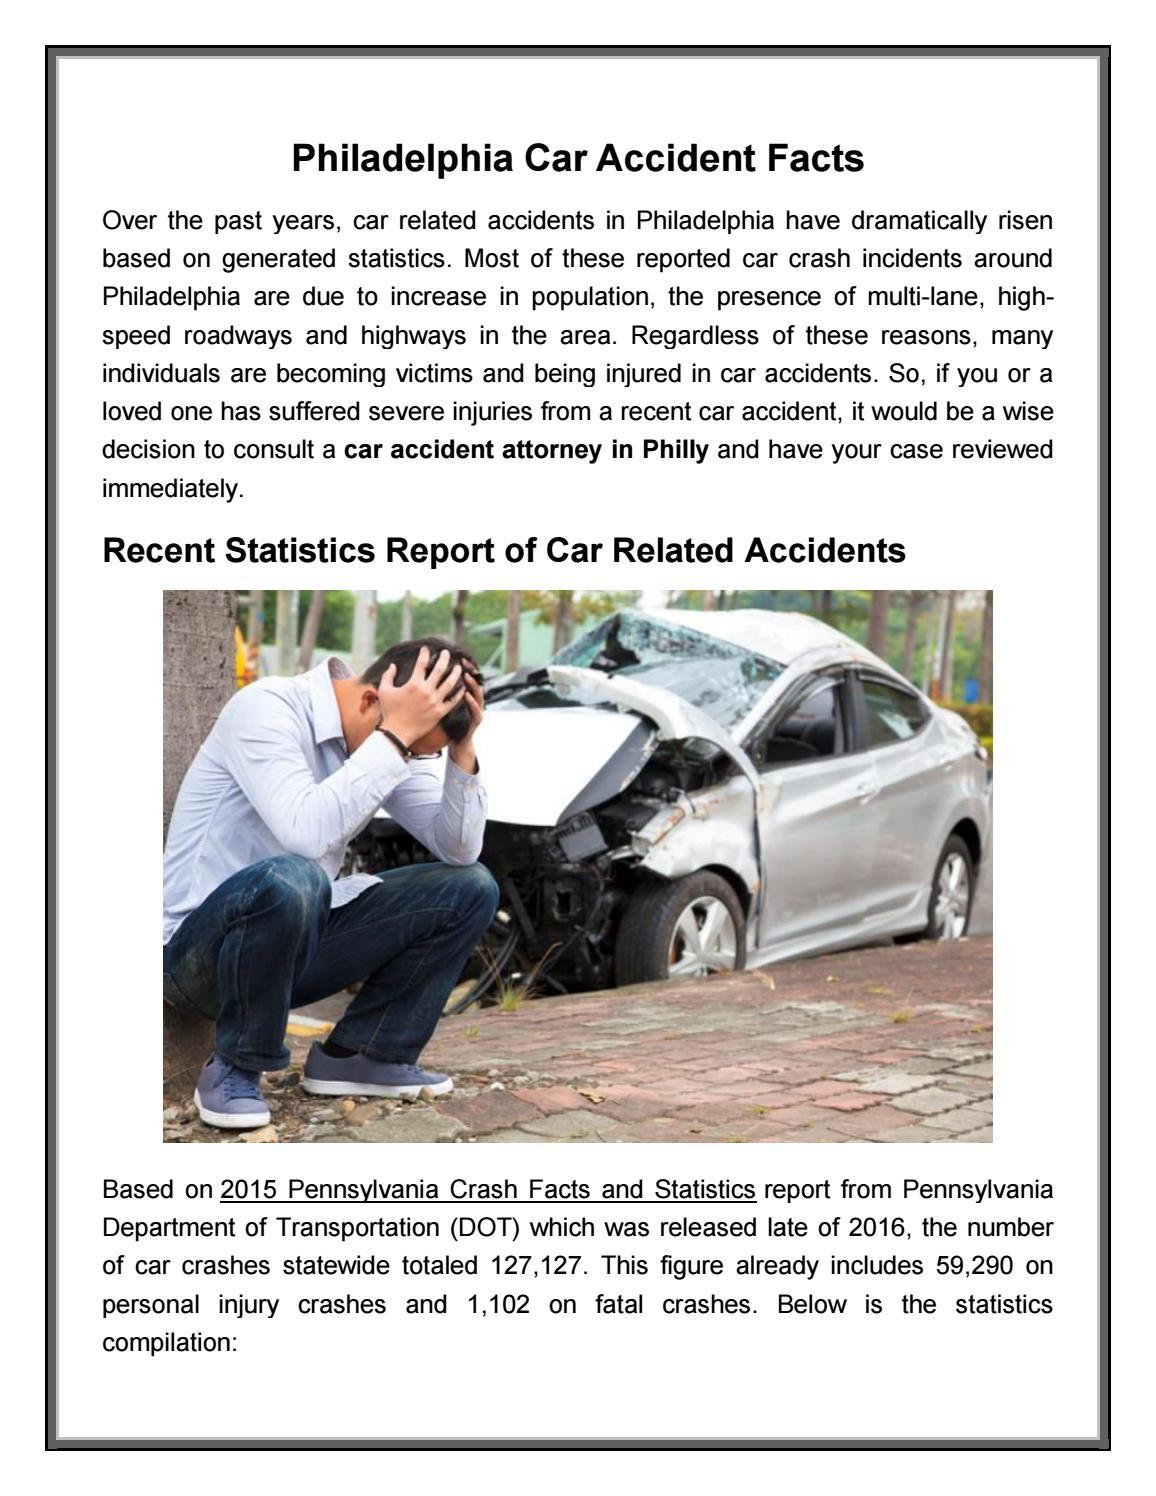 Philadelphia car accident facts by Philadelphia-Injury